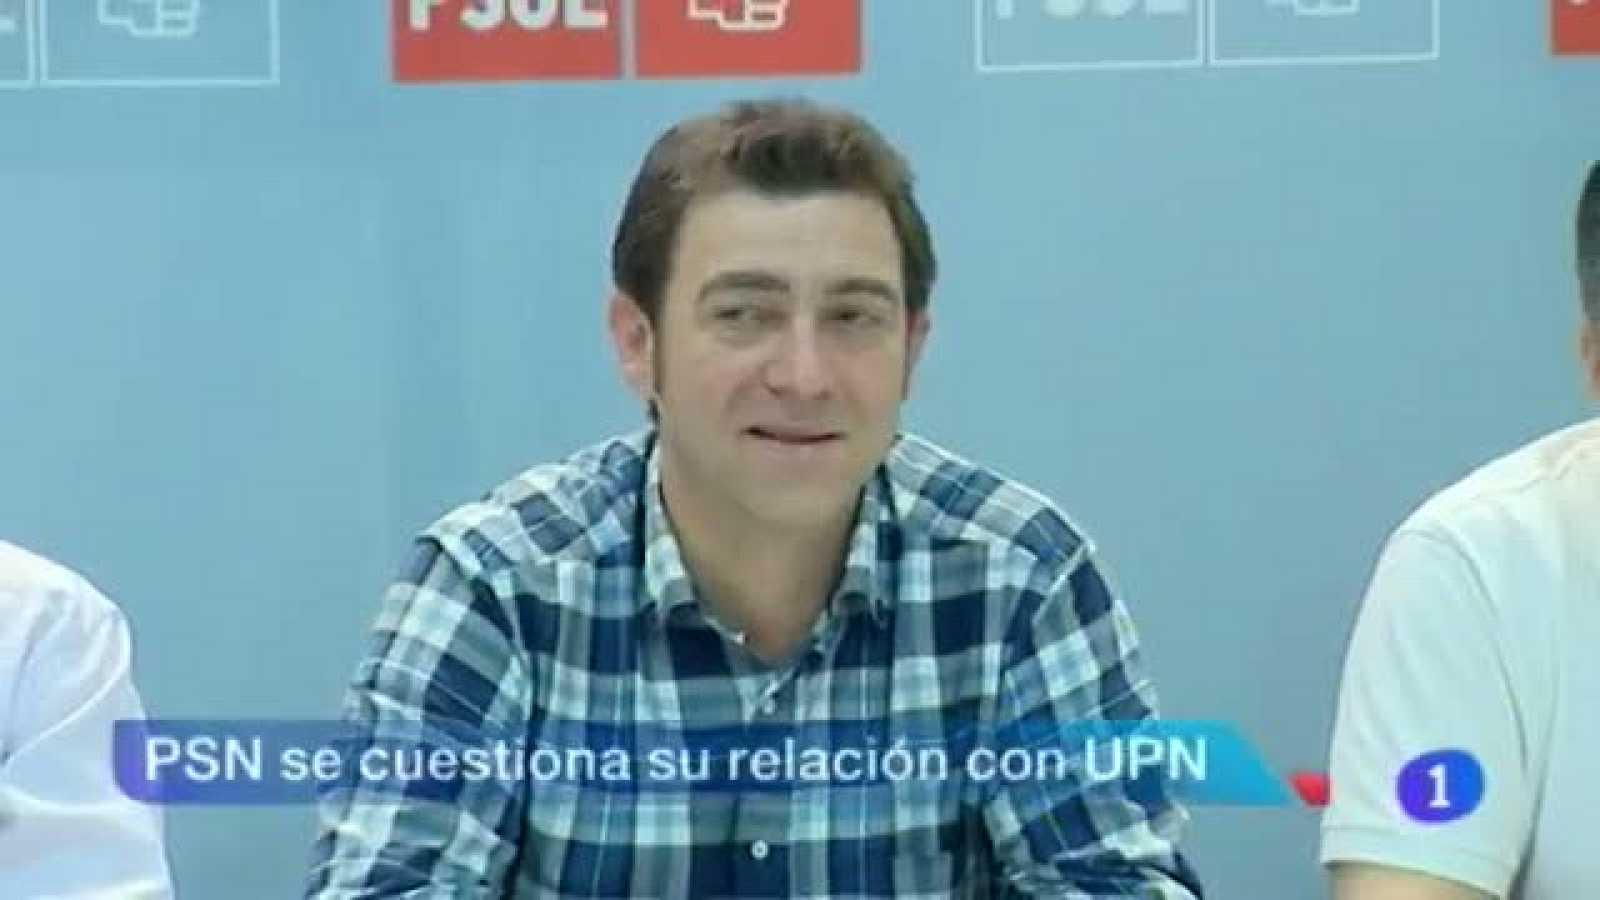 Telenavarra - 04/11/2013 - RTVE.es